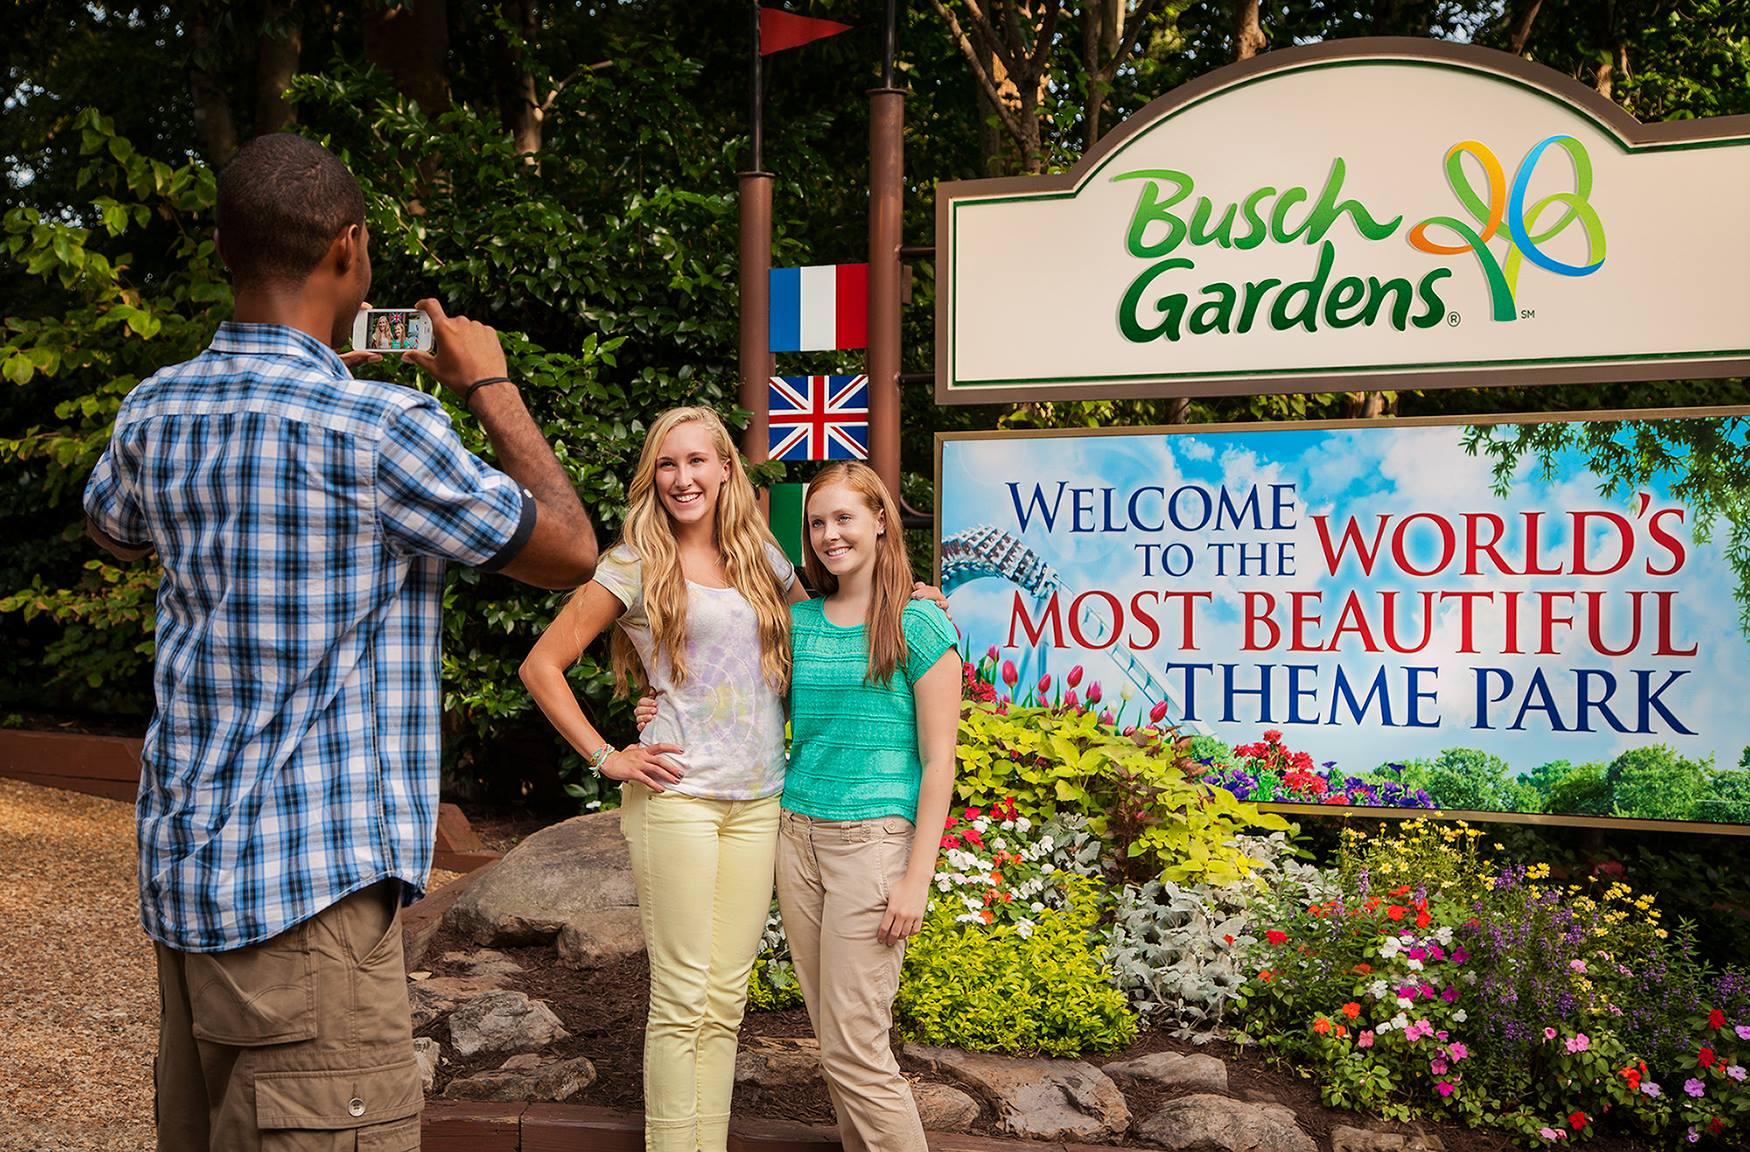 Busch Gardens Work and Travel IECenter